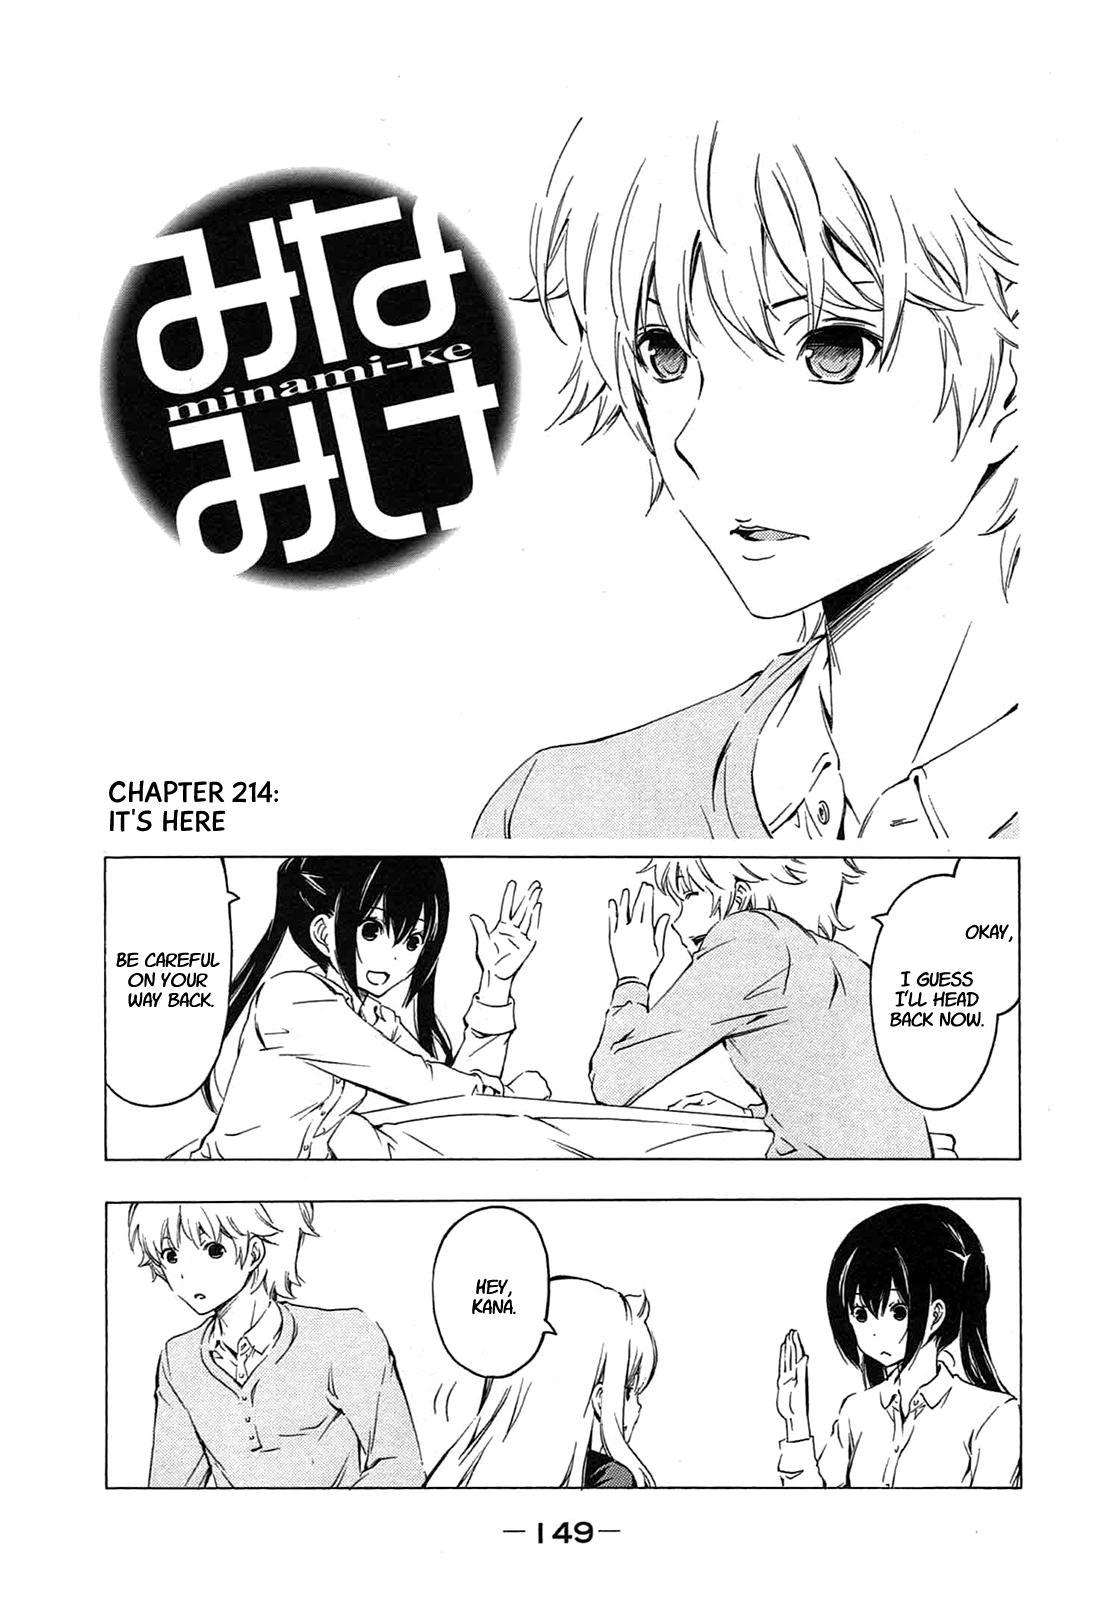 Minami-ke - Chapter 201